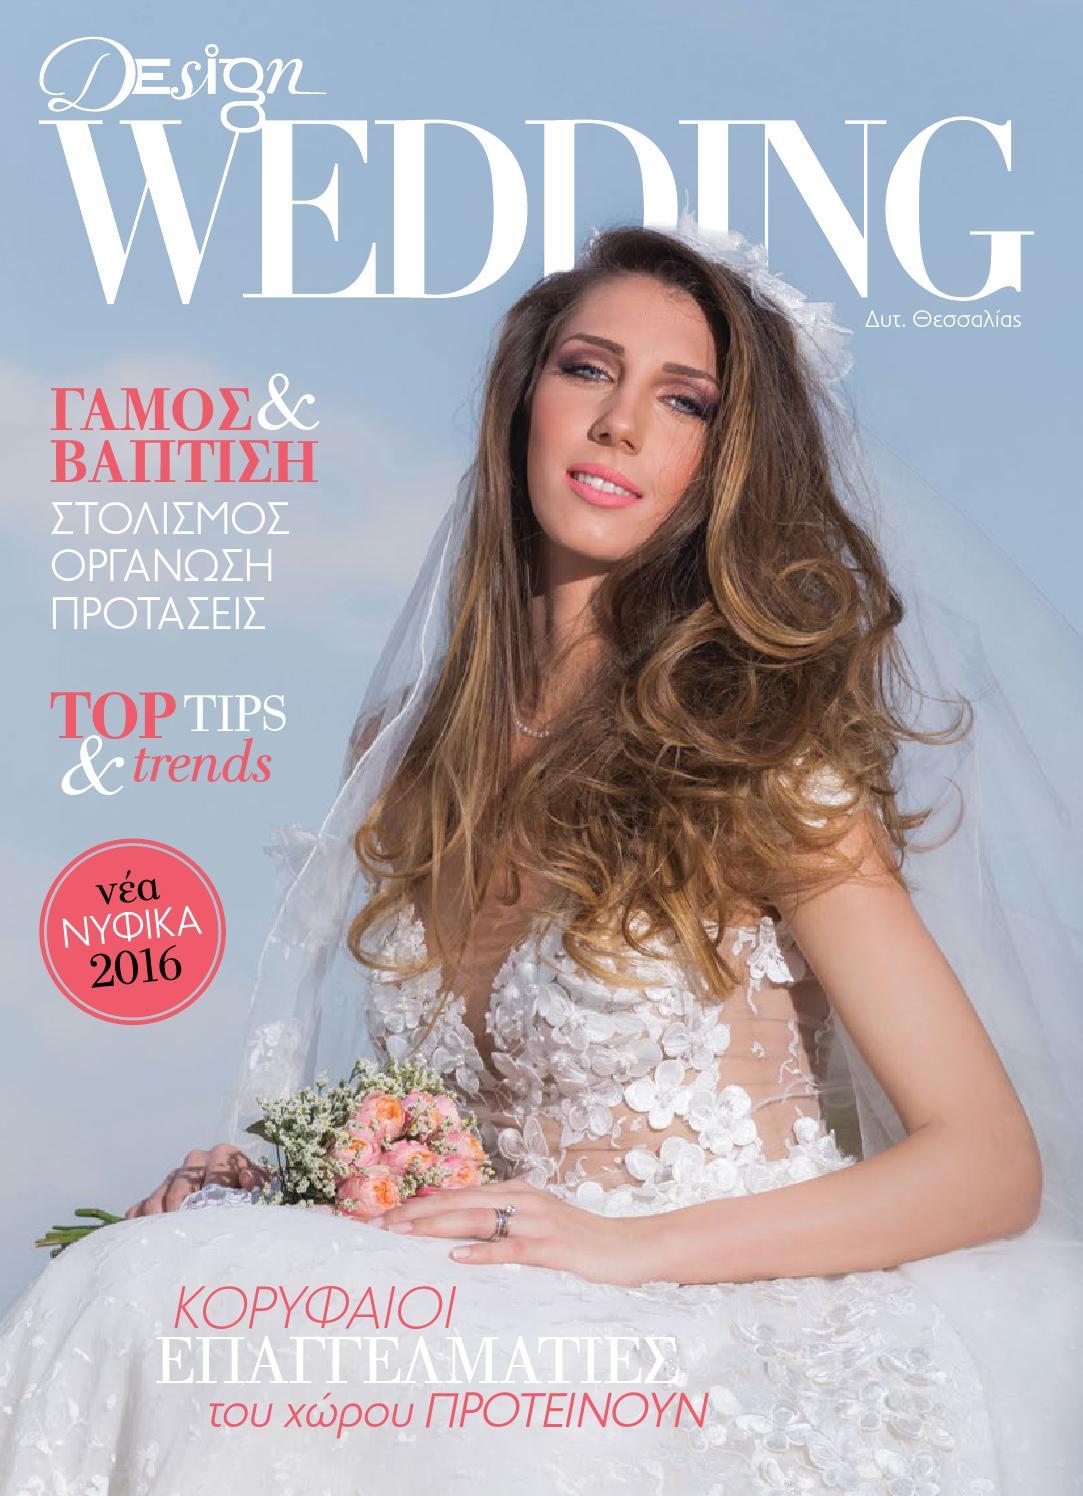 Design Wedding 2016 by Design Magazine - issuu c0025ee77e0